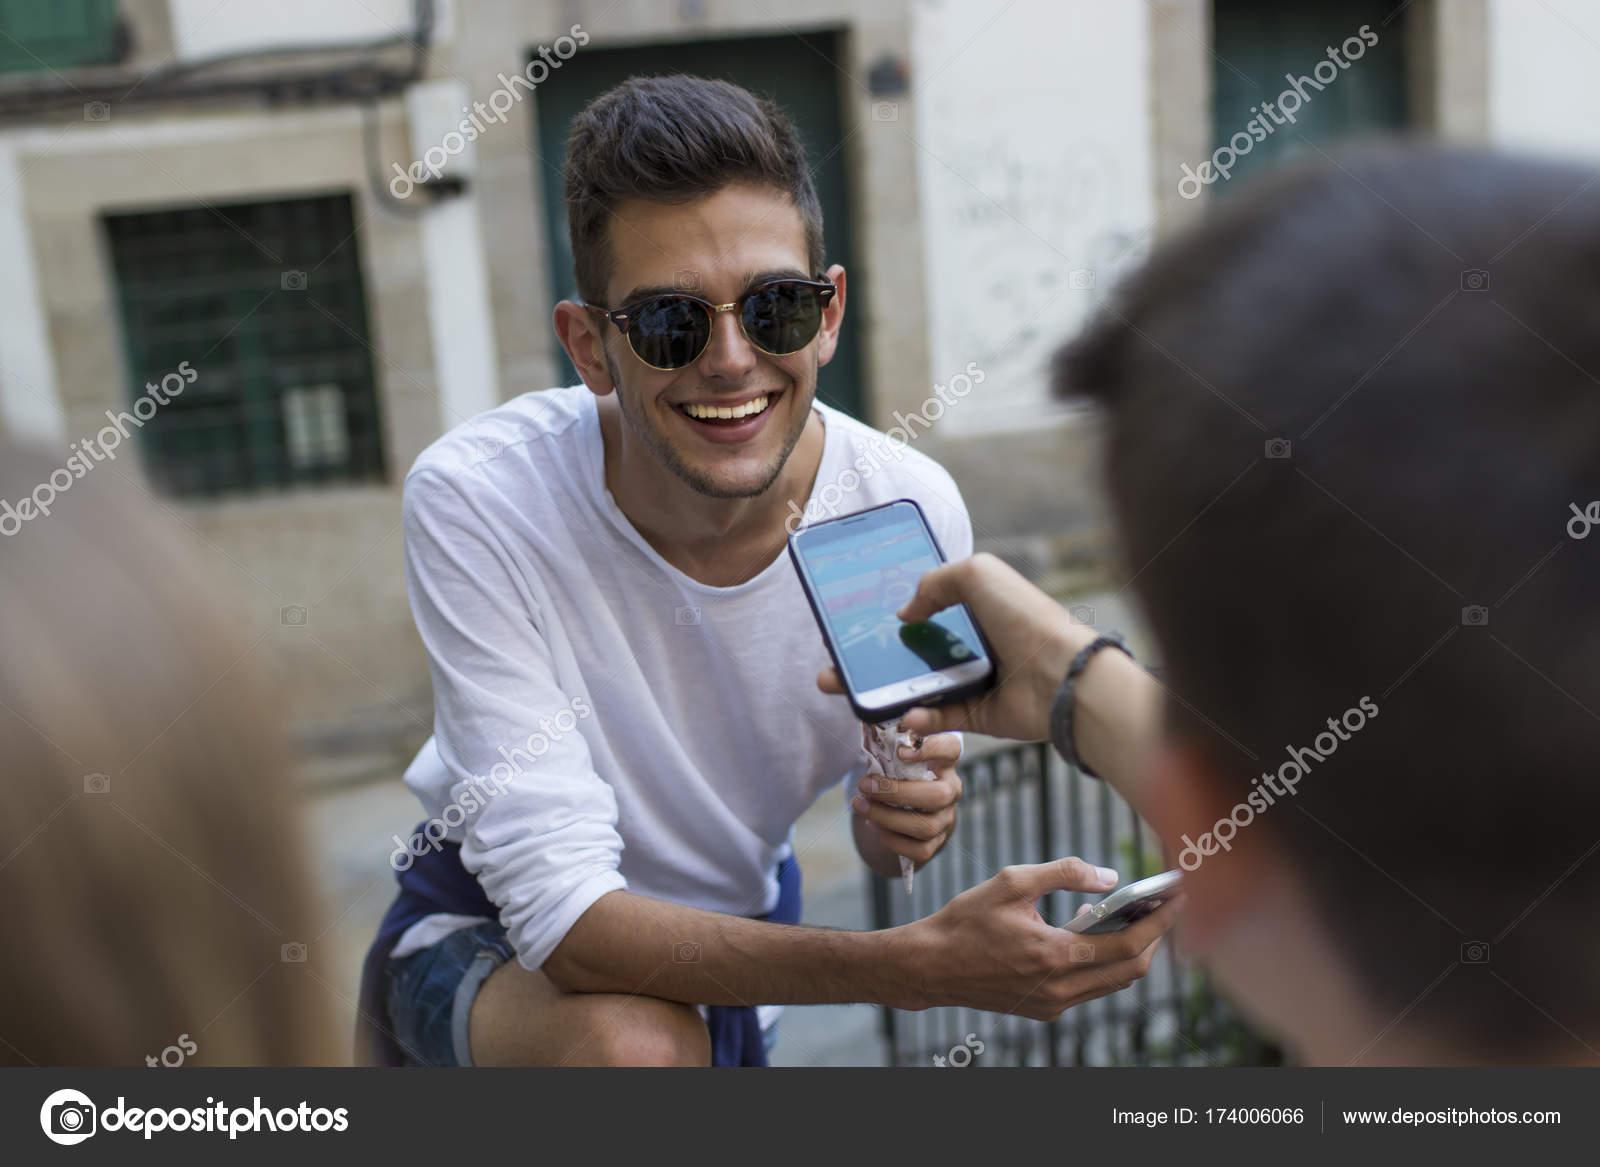 23acab81ba61 Youth Group Mobile Phone Street — Stock Photo © carballo  174006066